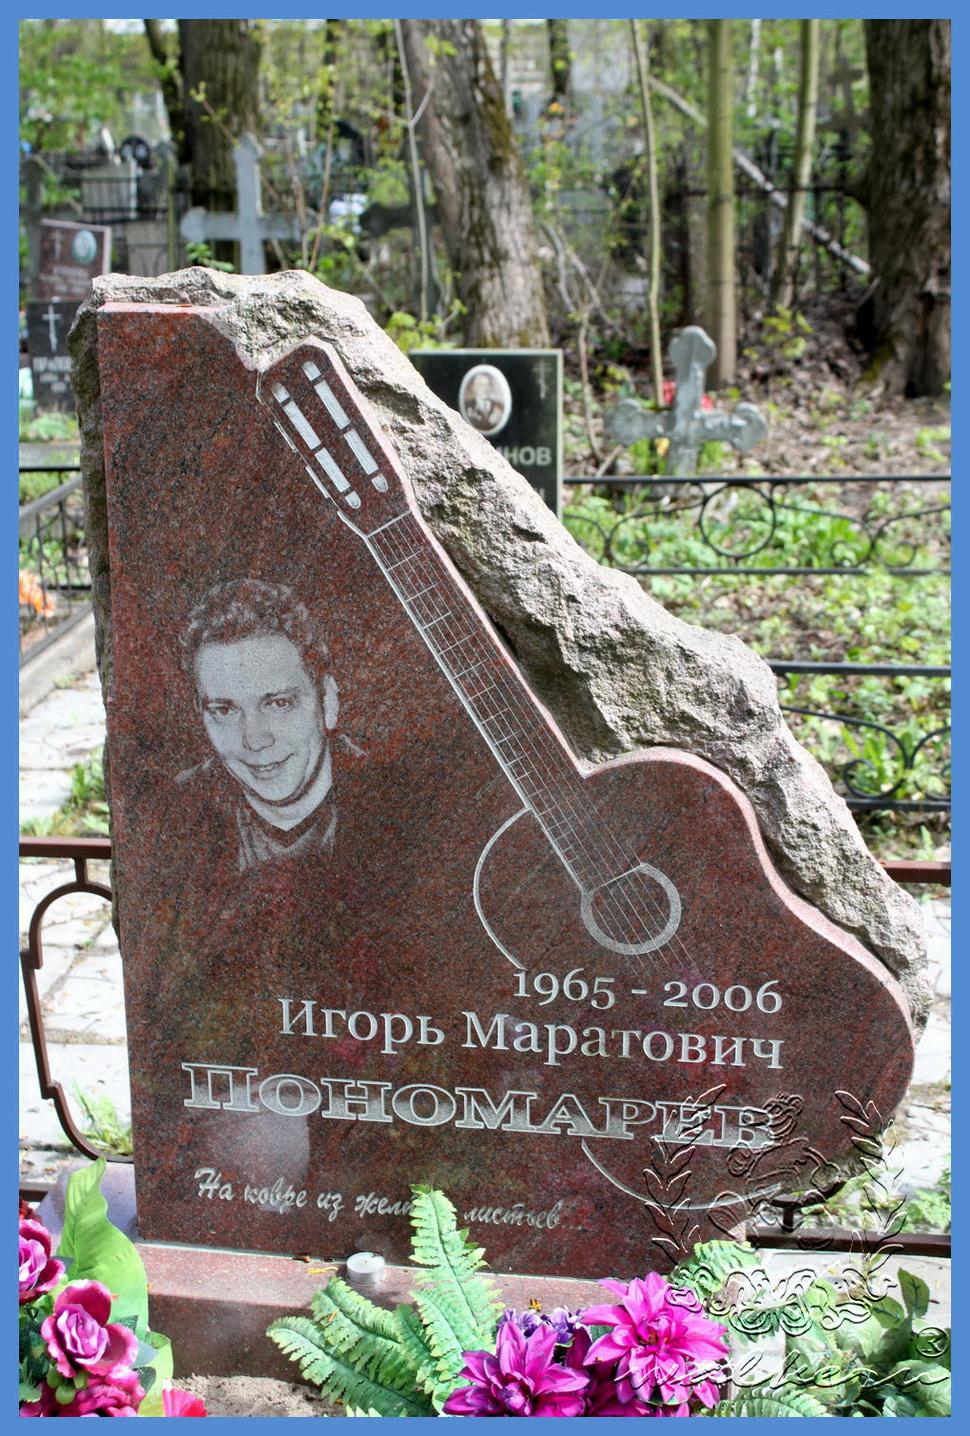 Пономарёв Игорь Маратович